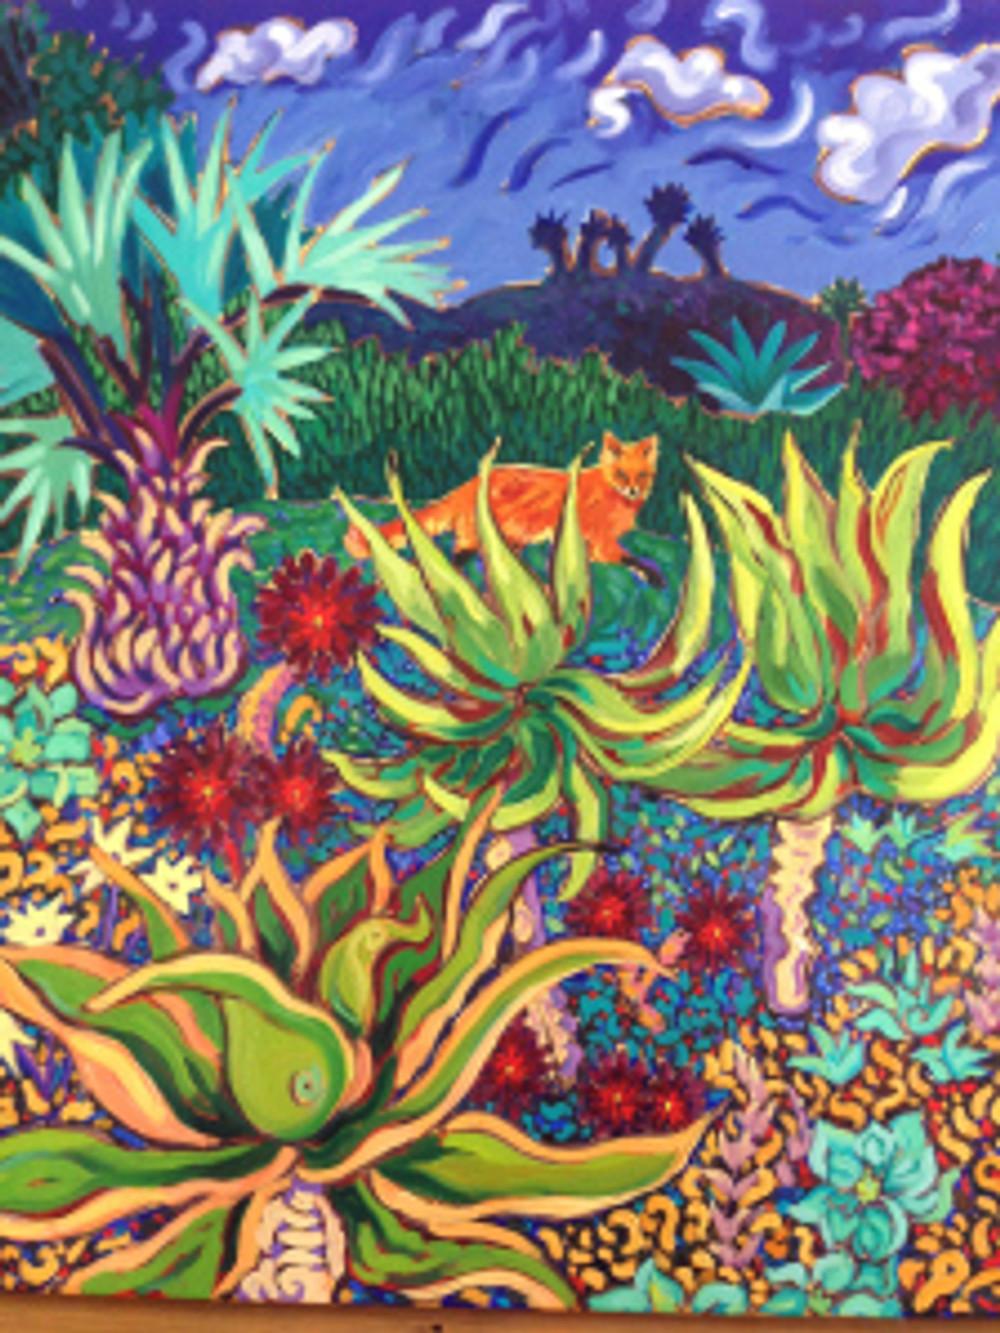 Fox in the Twilight Garden by Cathy Carey ©2014